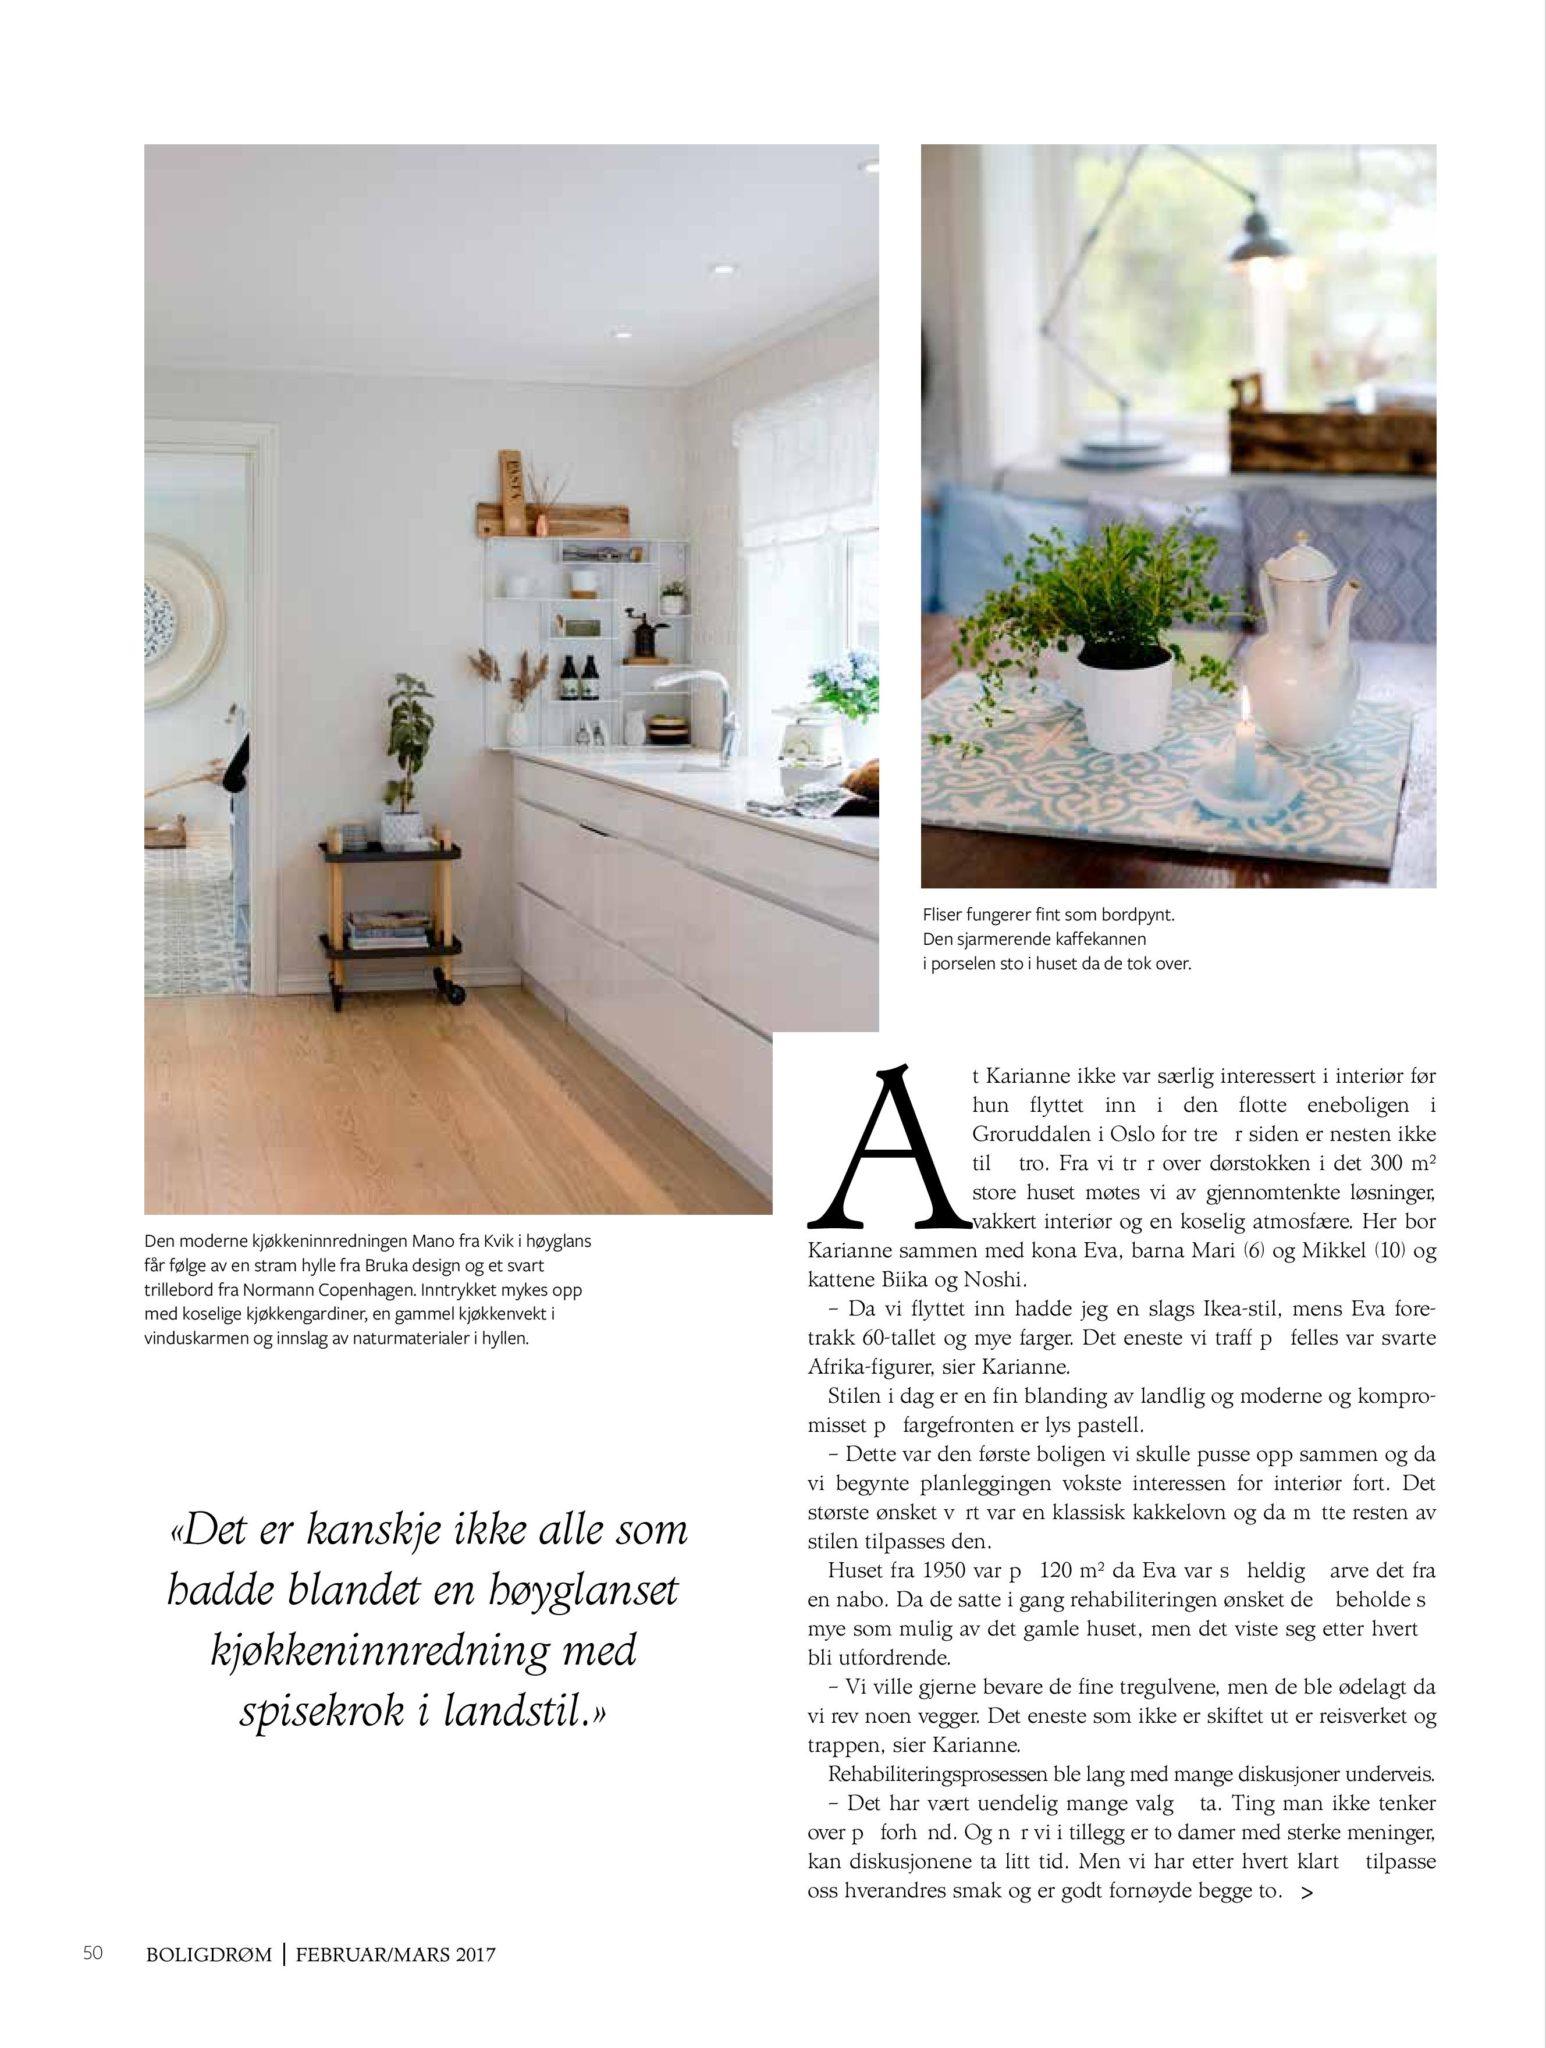 boligreportasje Karianne Gustavsen BoligDrøm nr. 2/2017 side 3